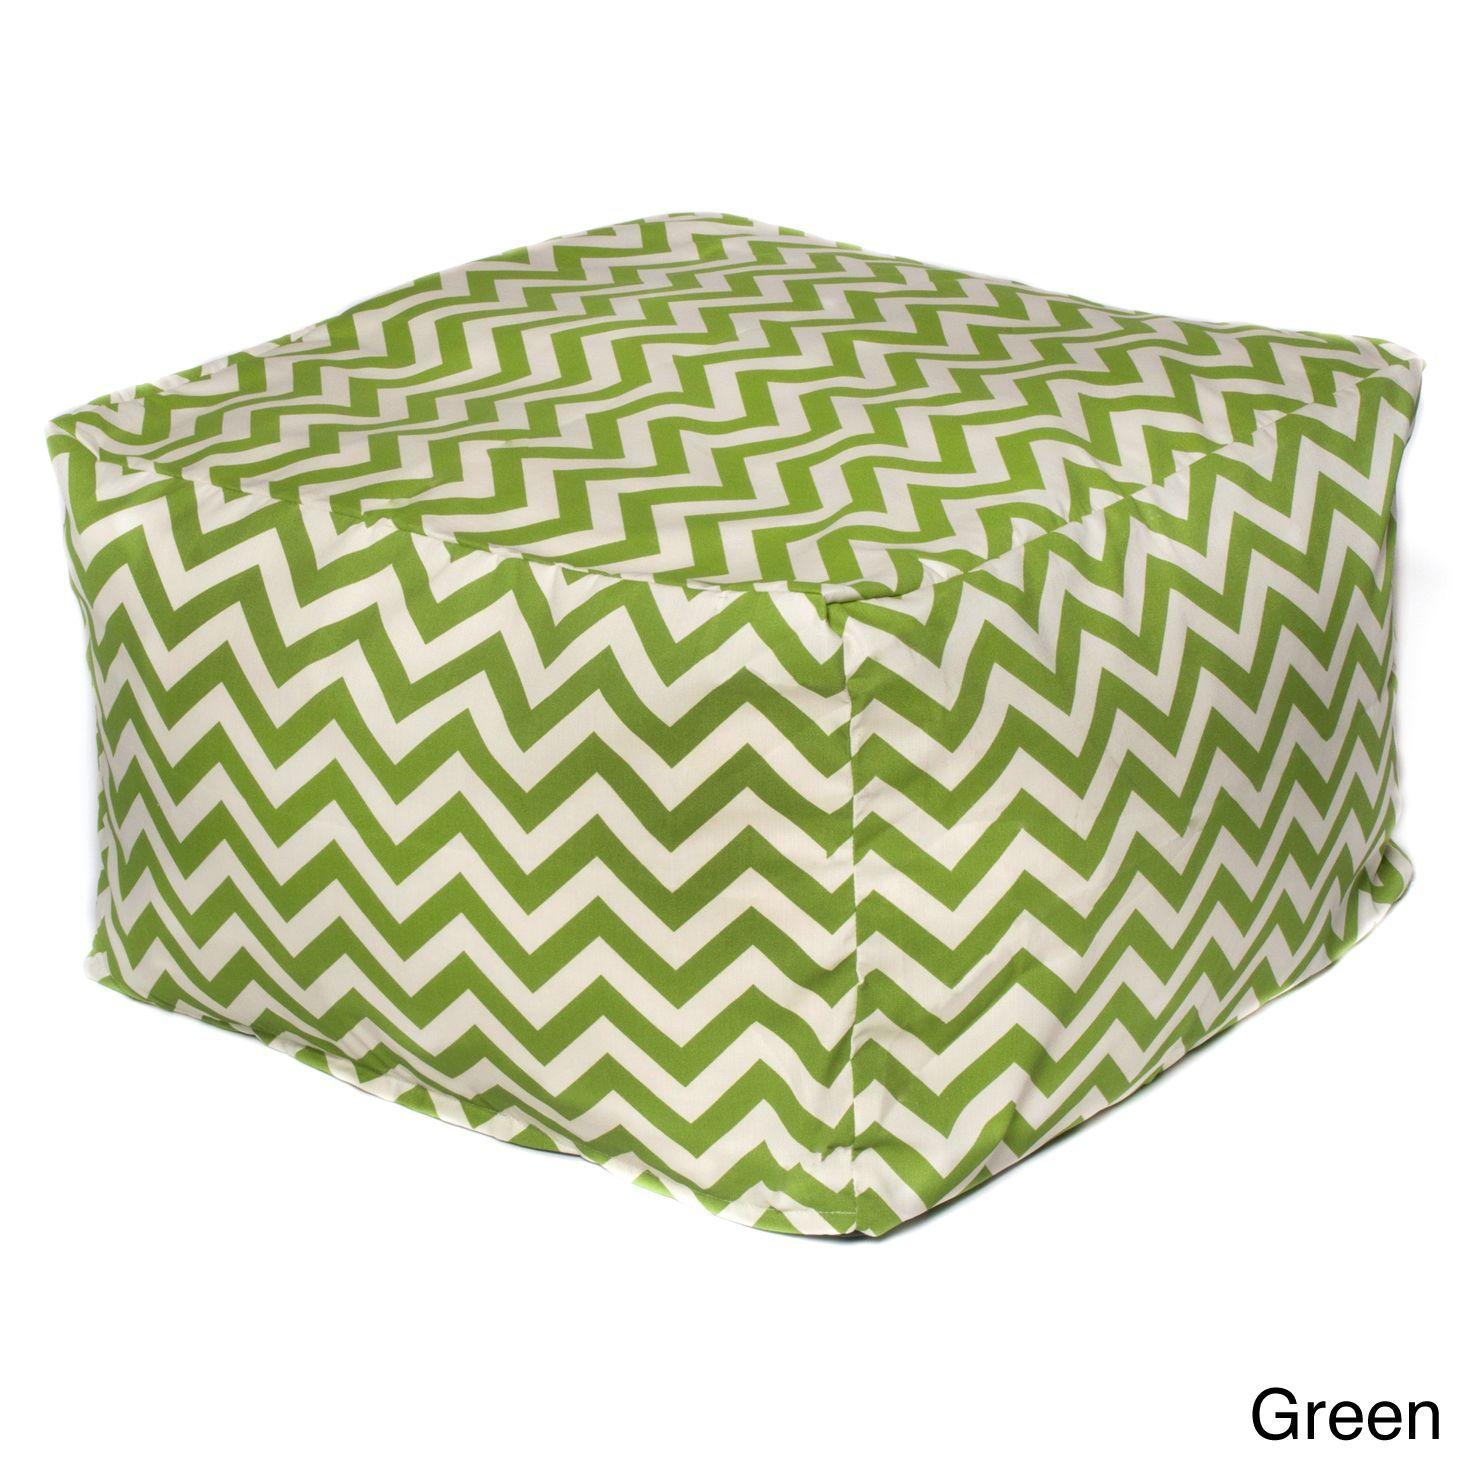 Swell Chateau Designs Outdoor Bean Bag Ottoman Green Chevron Inzonedesignstudio Interior Chair Design Inzonedesignstudiocom